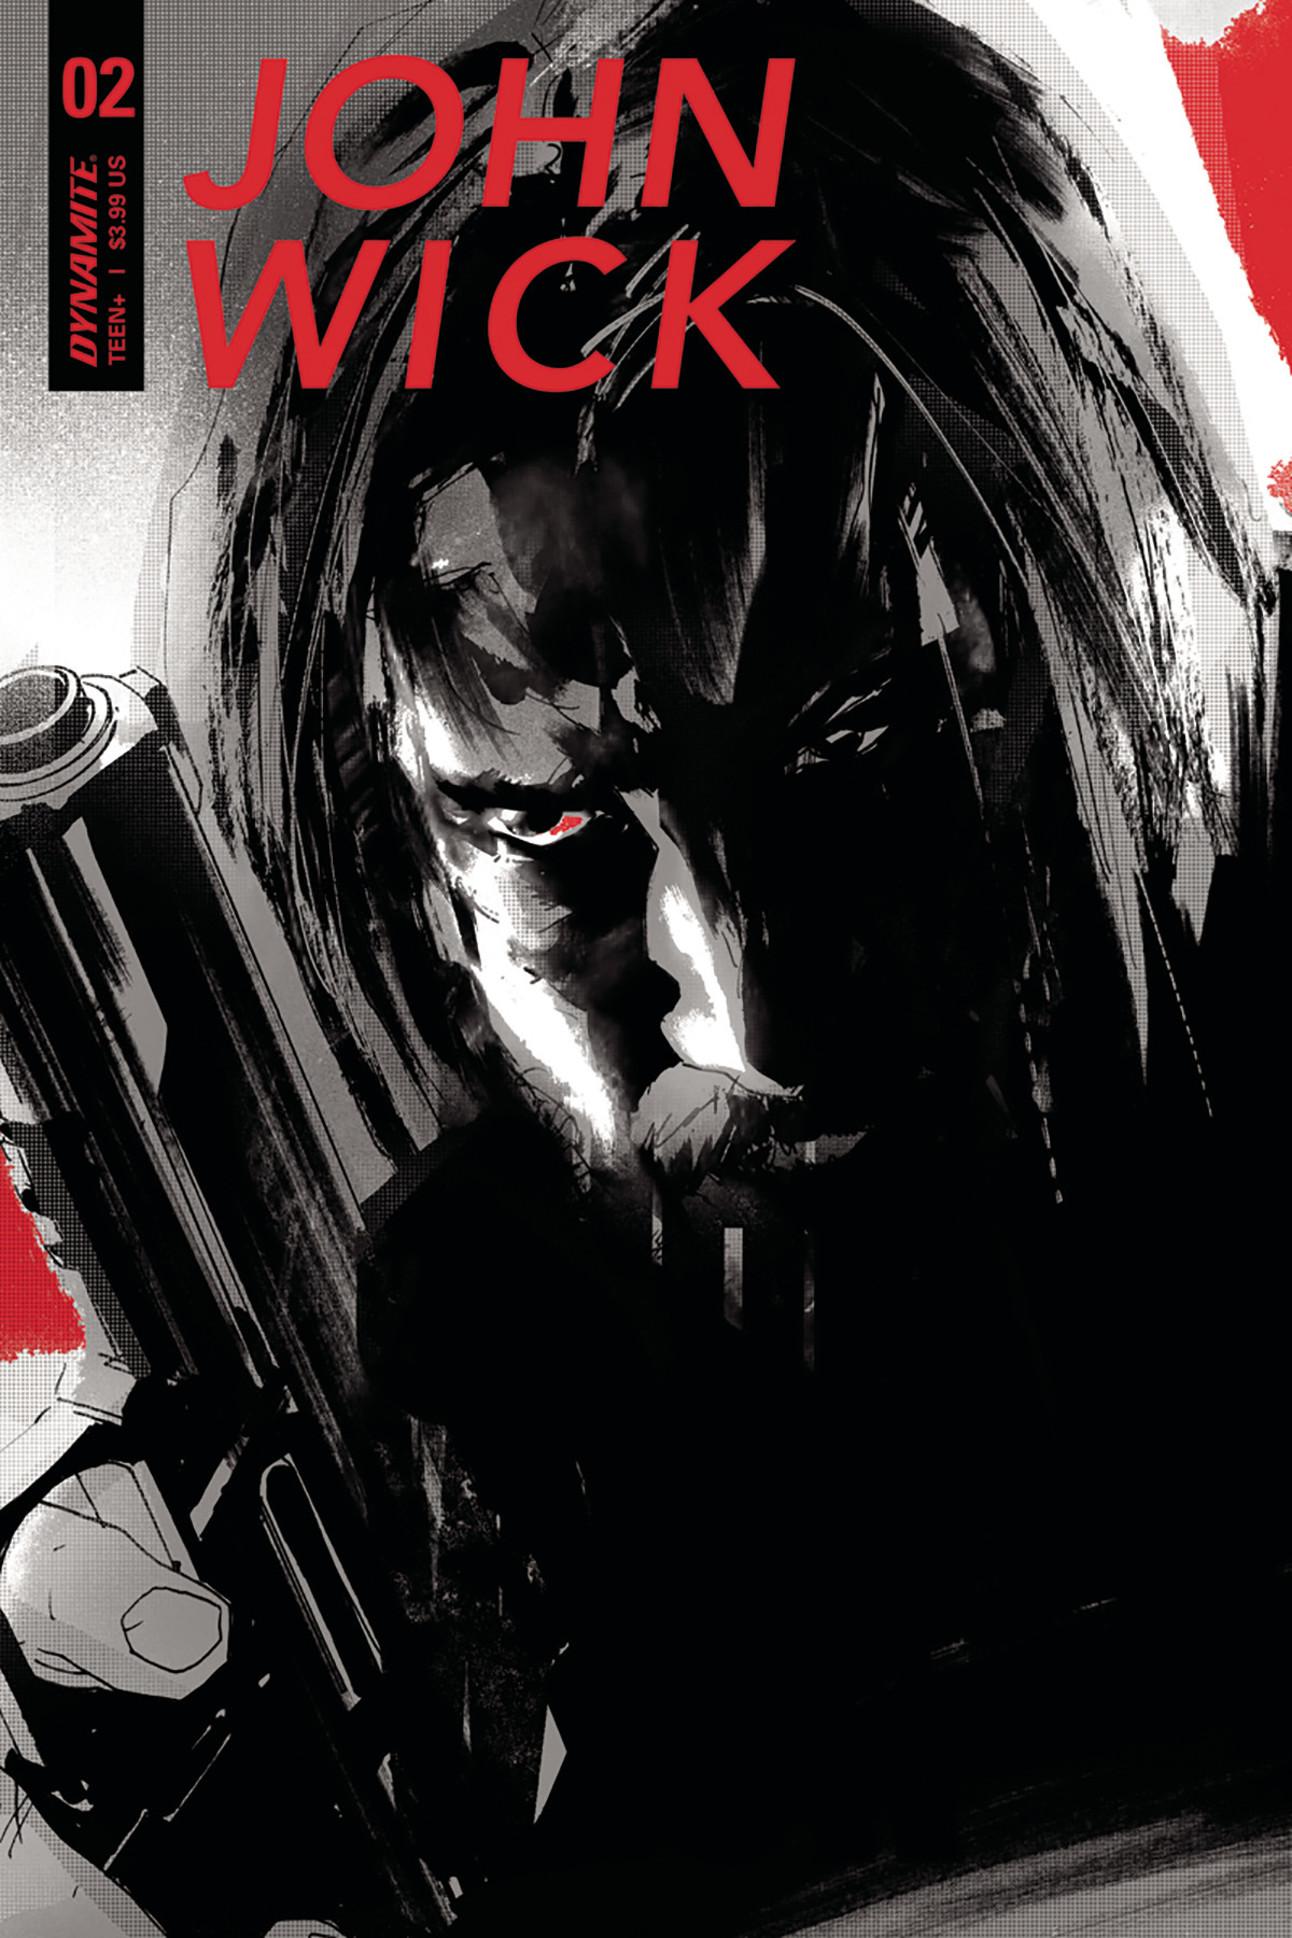 John Wick #2 Cover by Jock